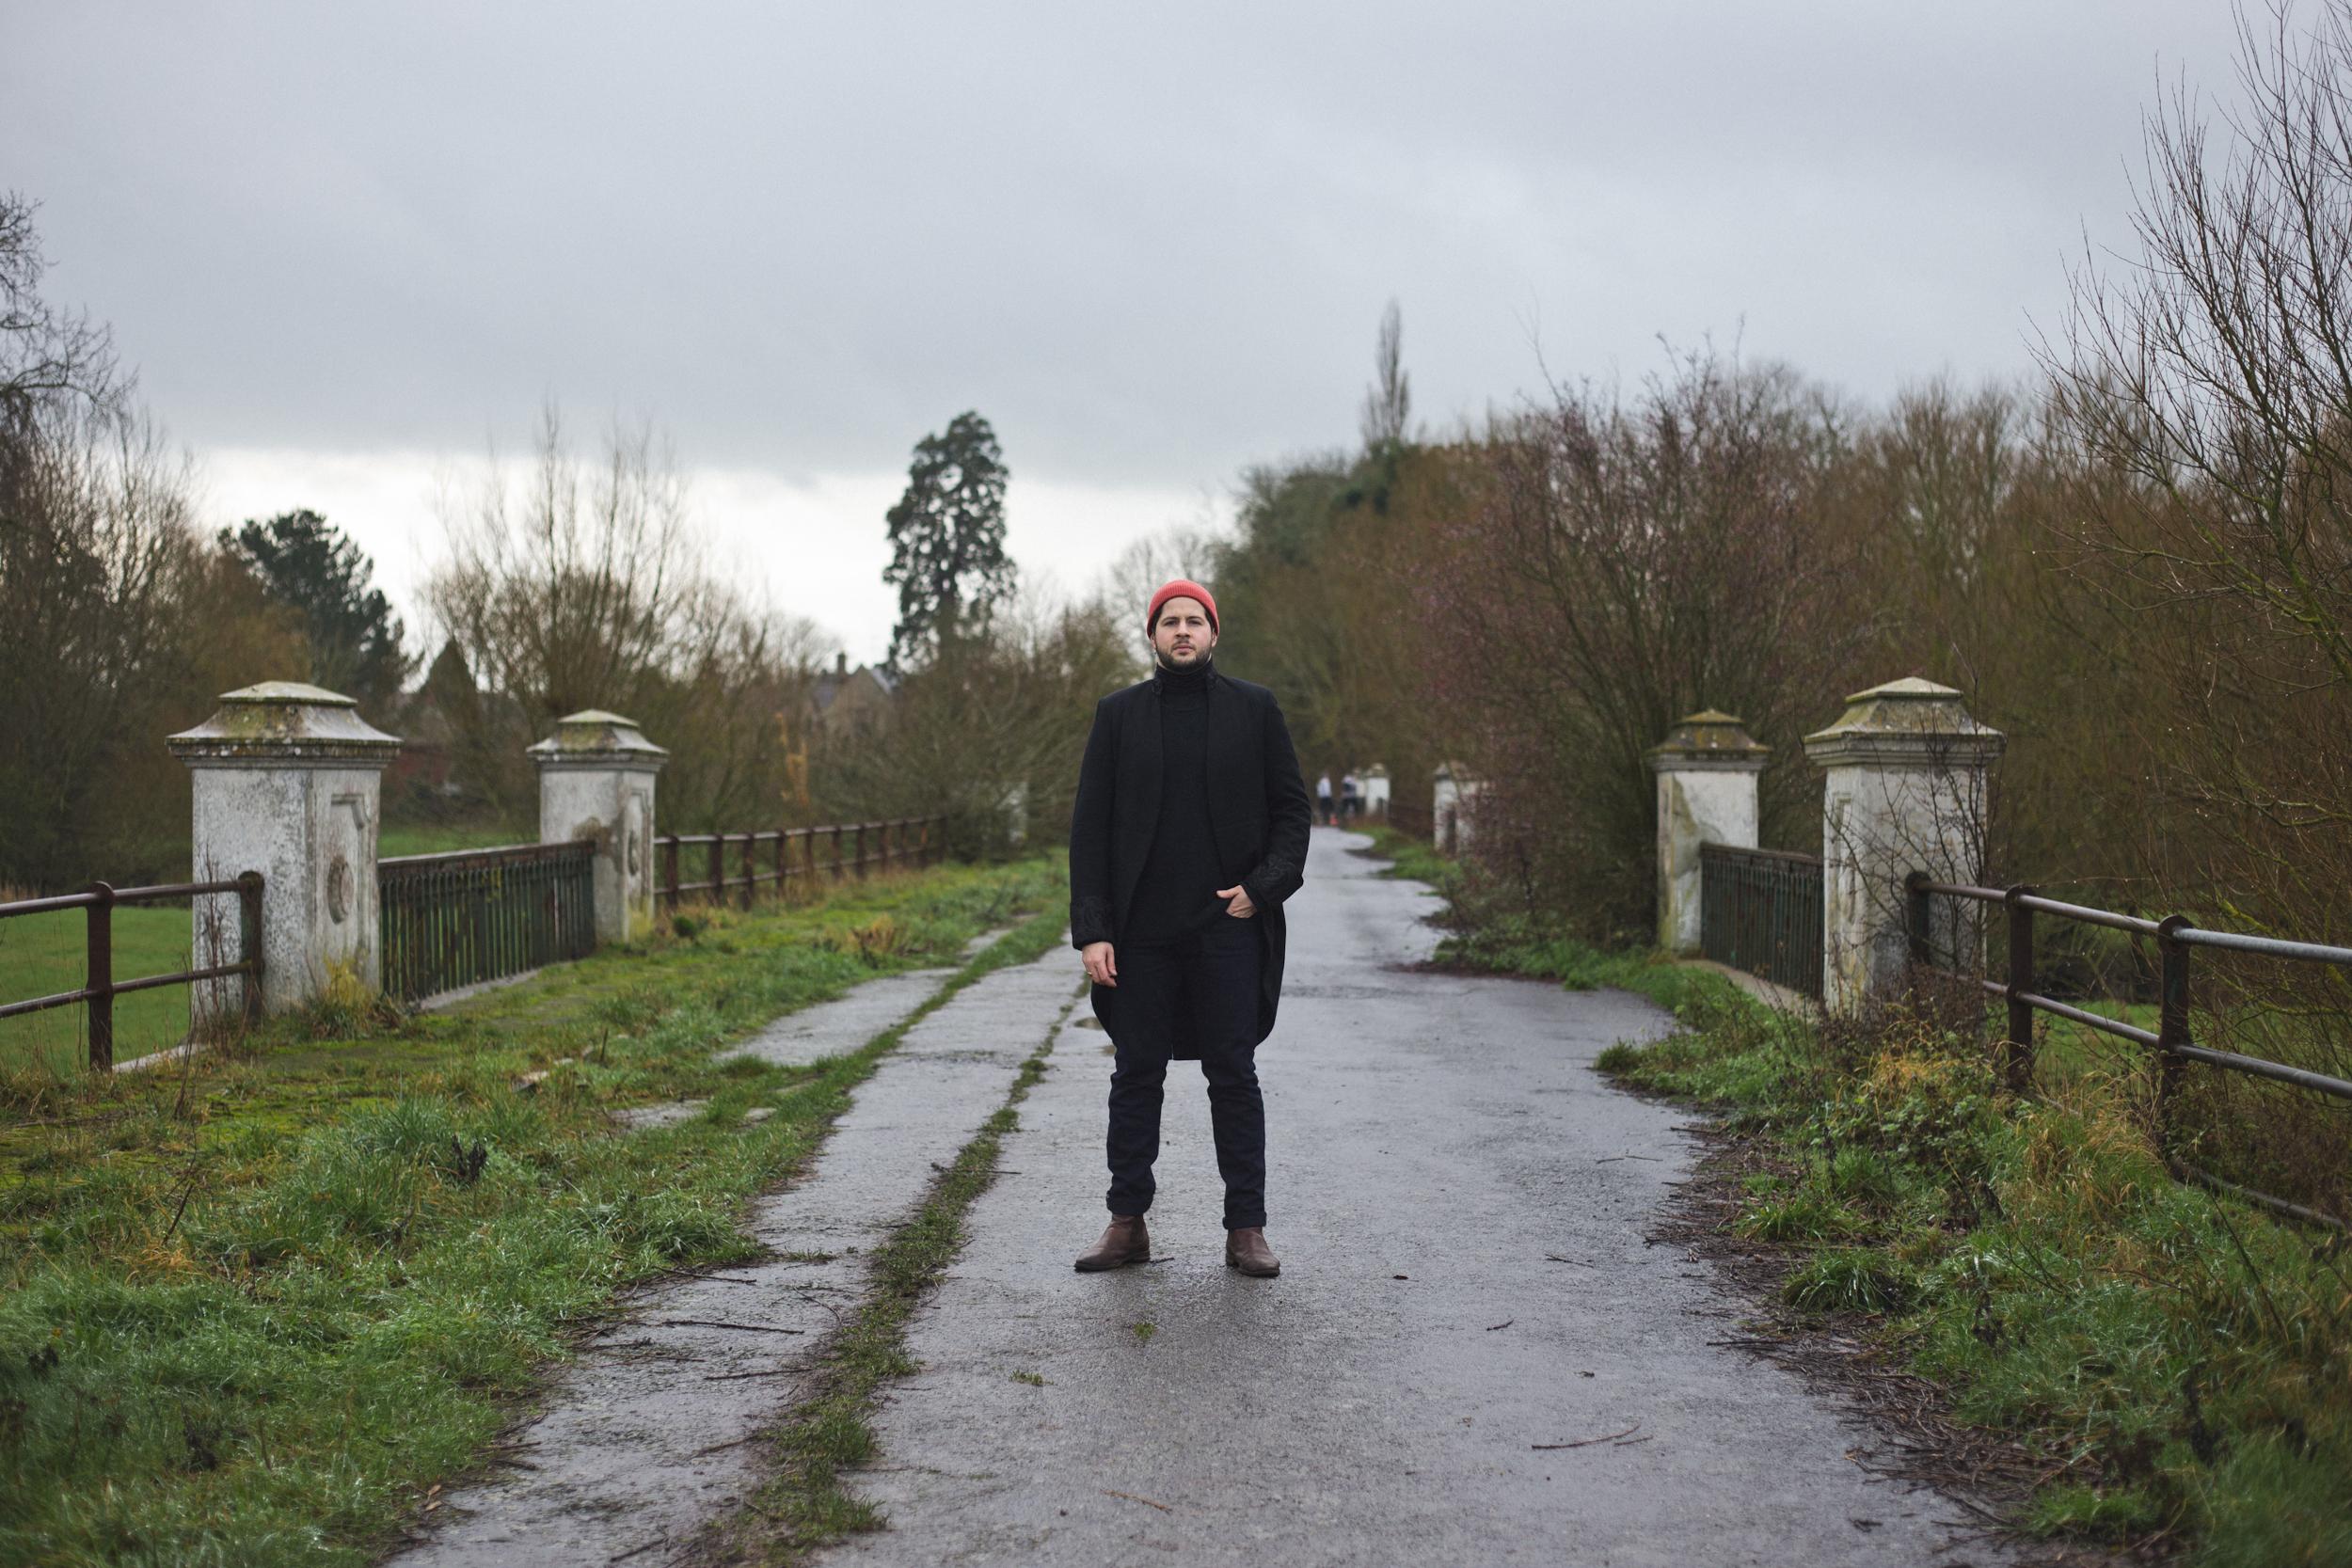 Rupert Enticknap, countertenor, Oxfordshire, 2015